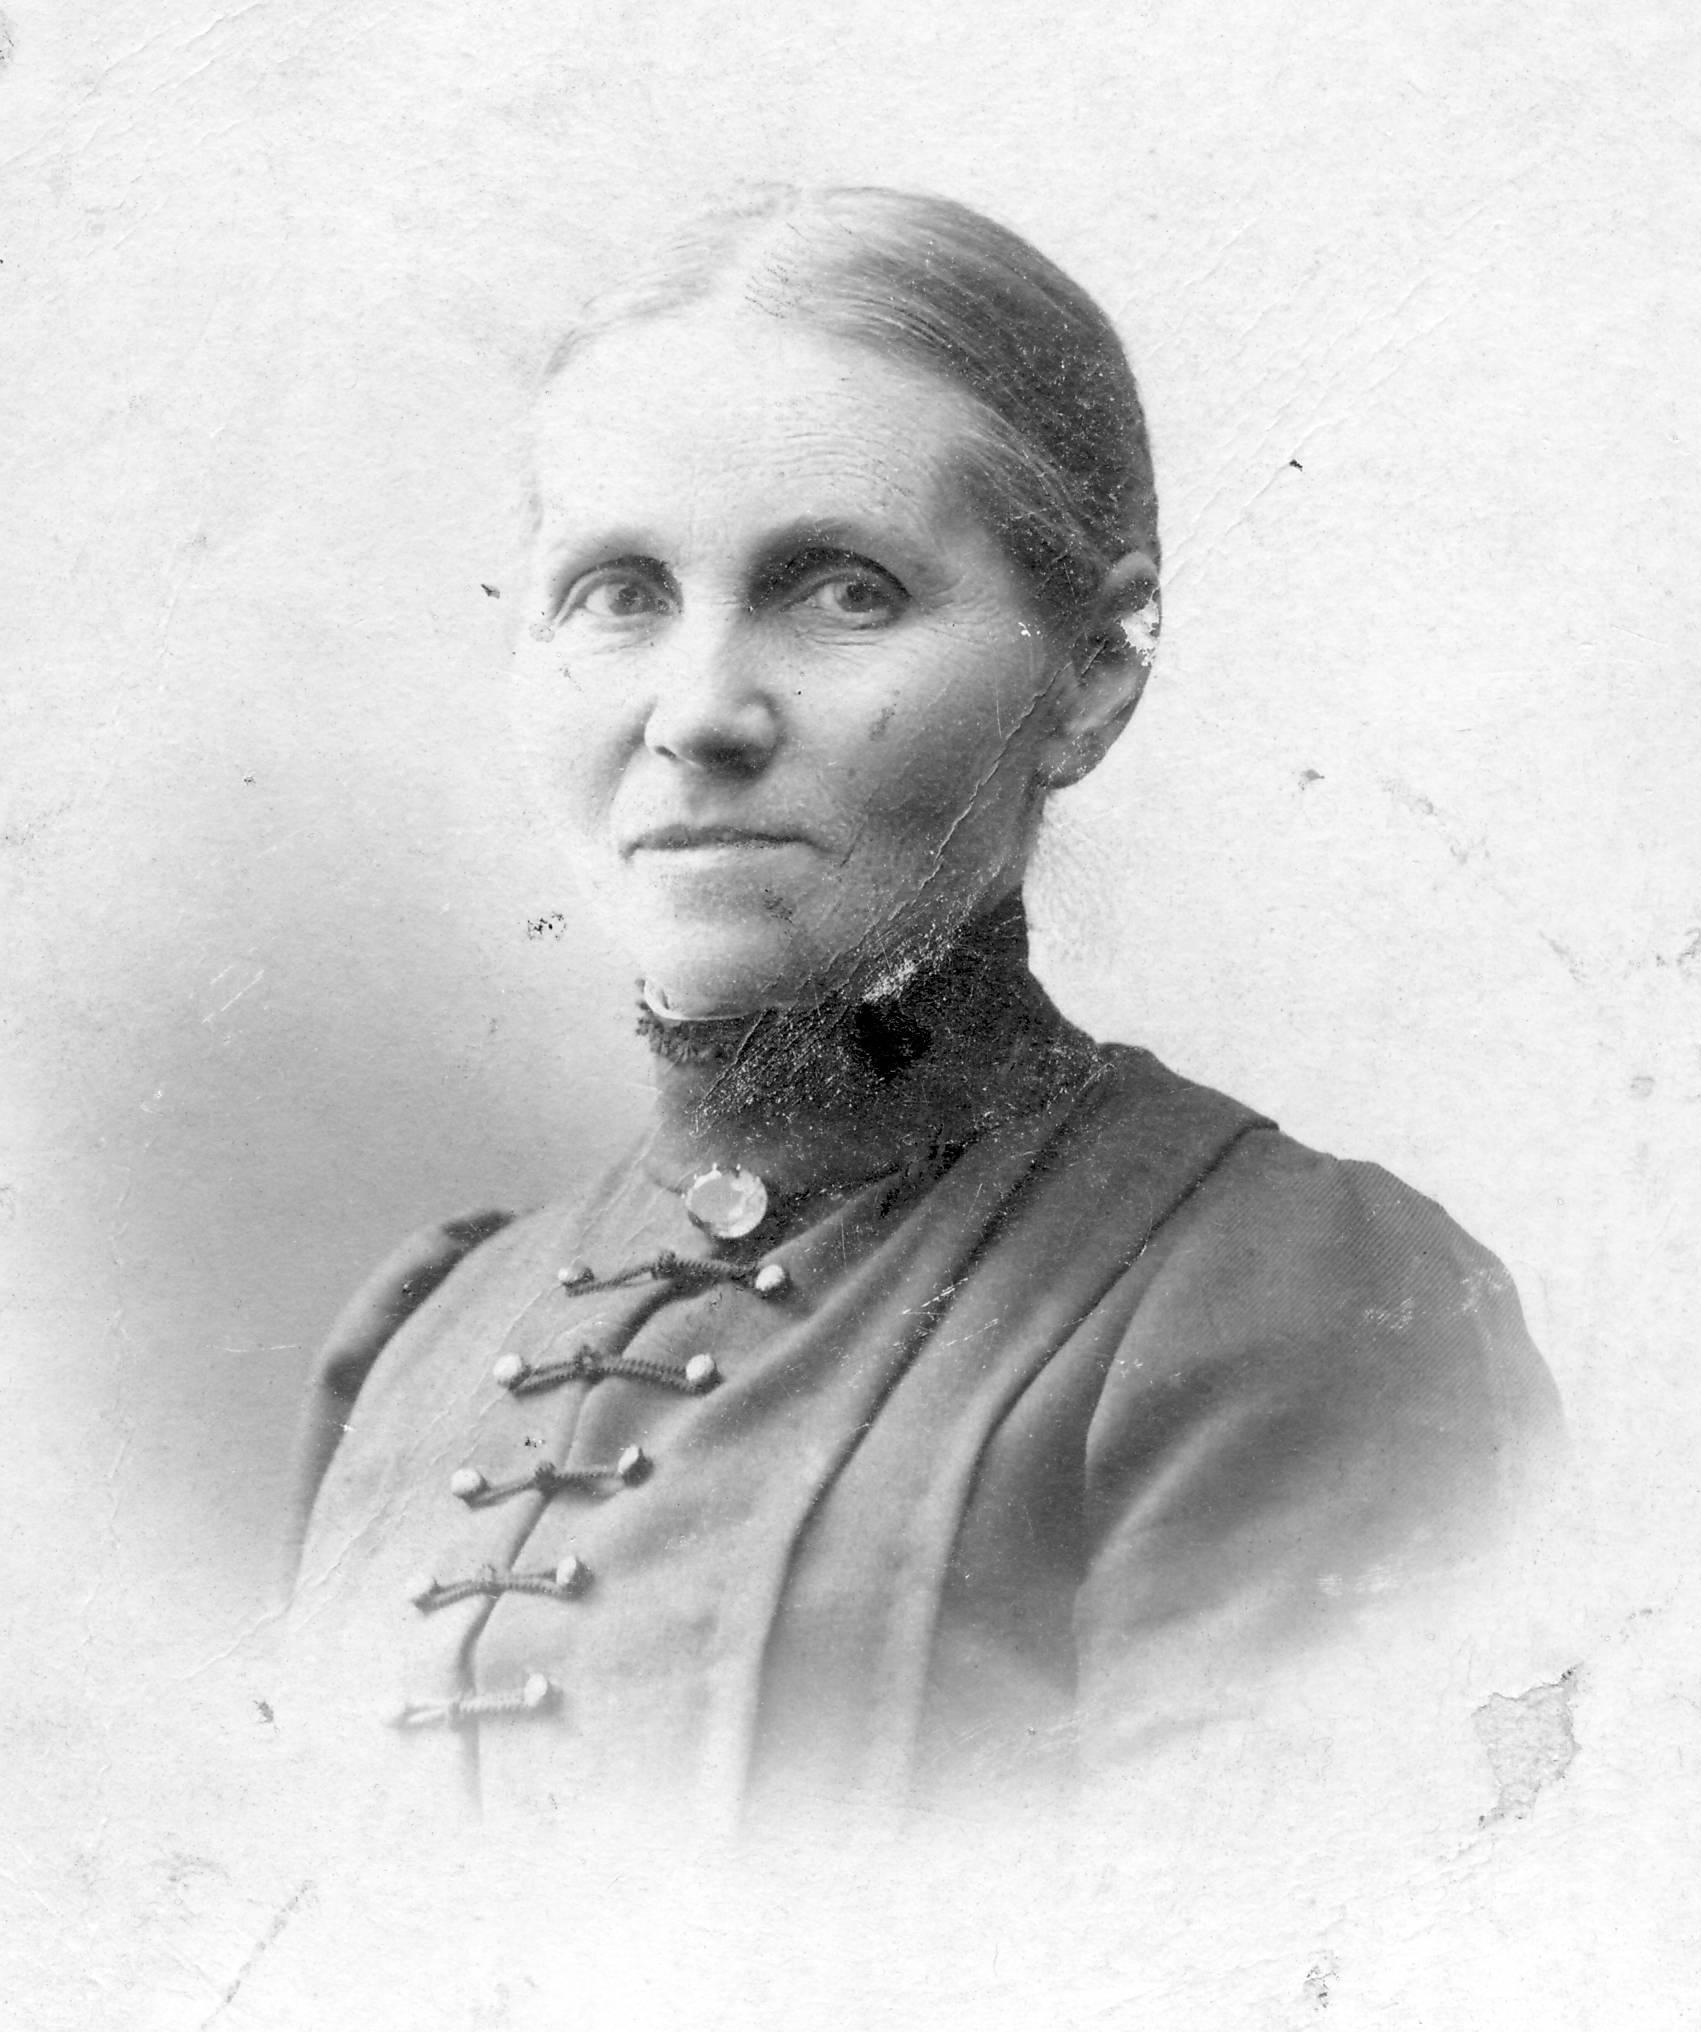 Anna Wagner